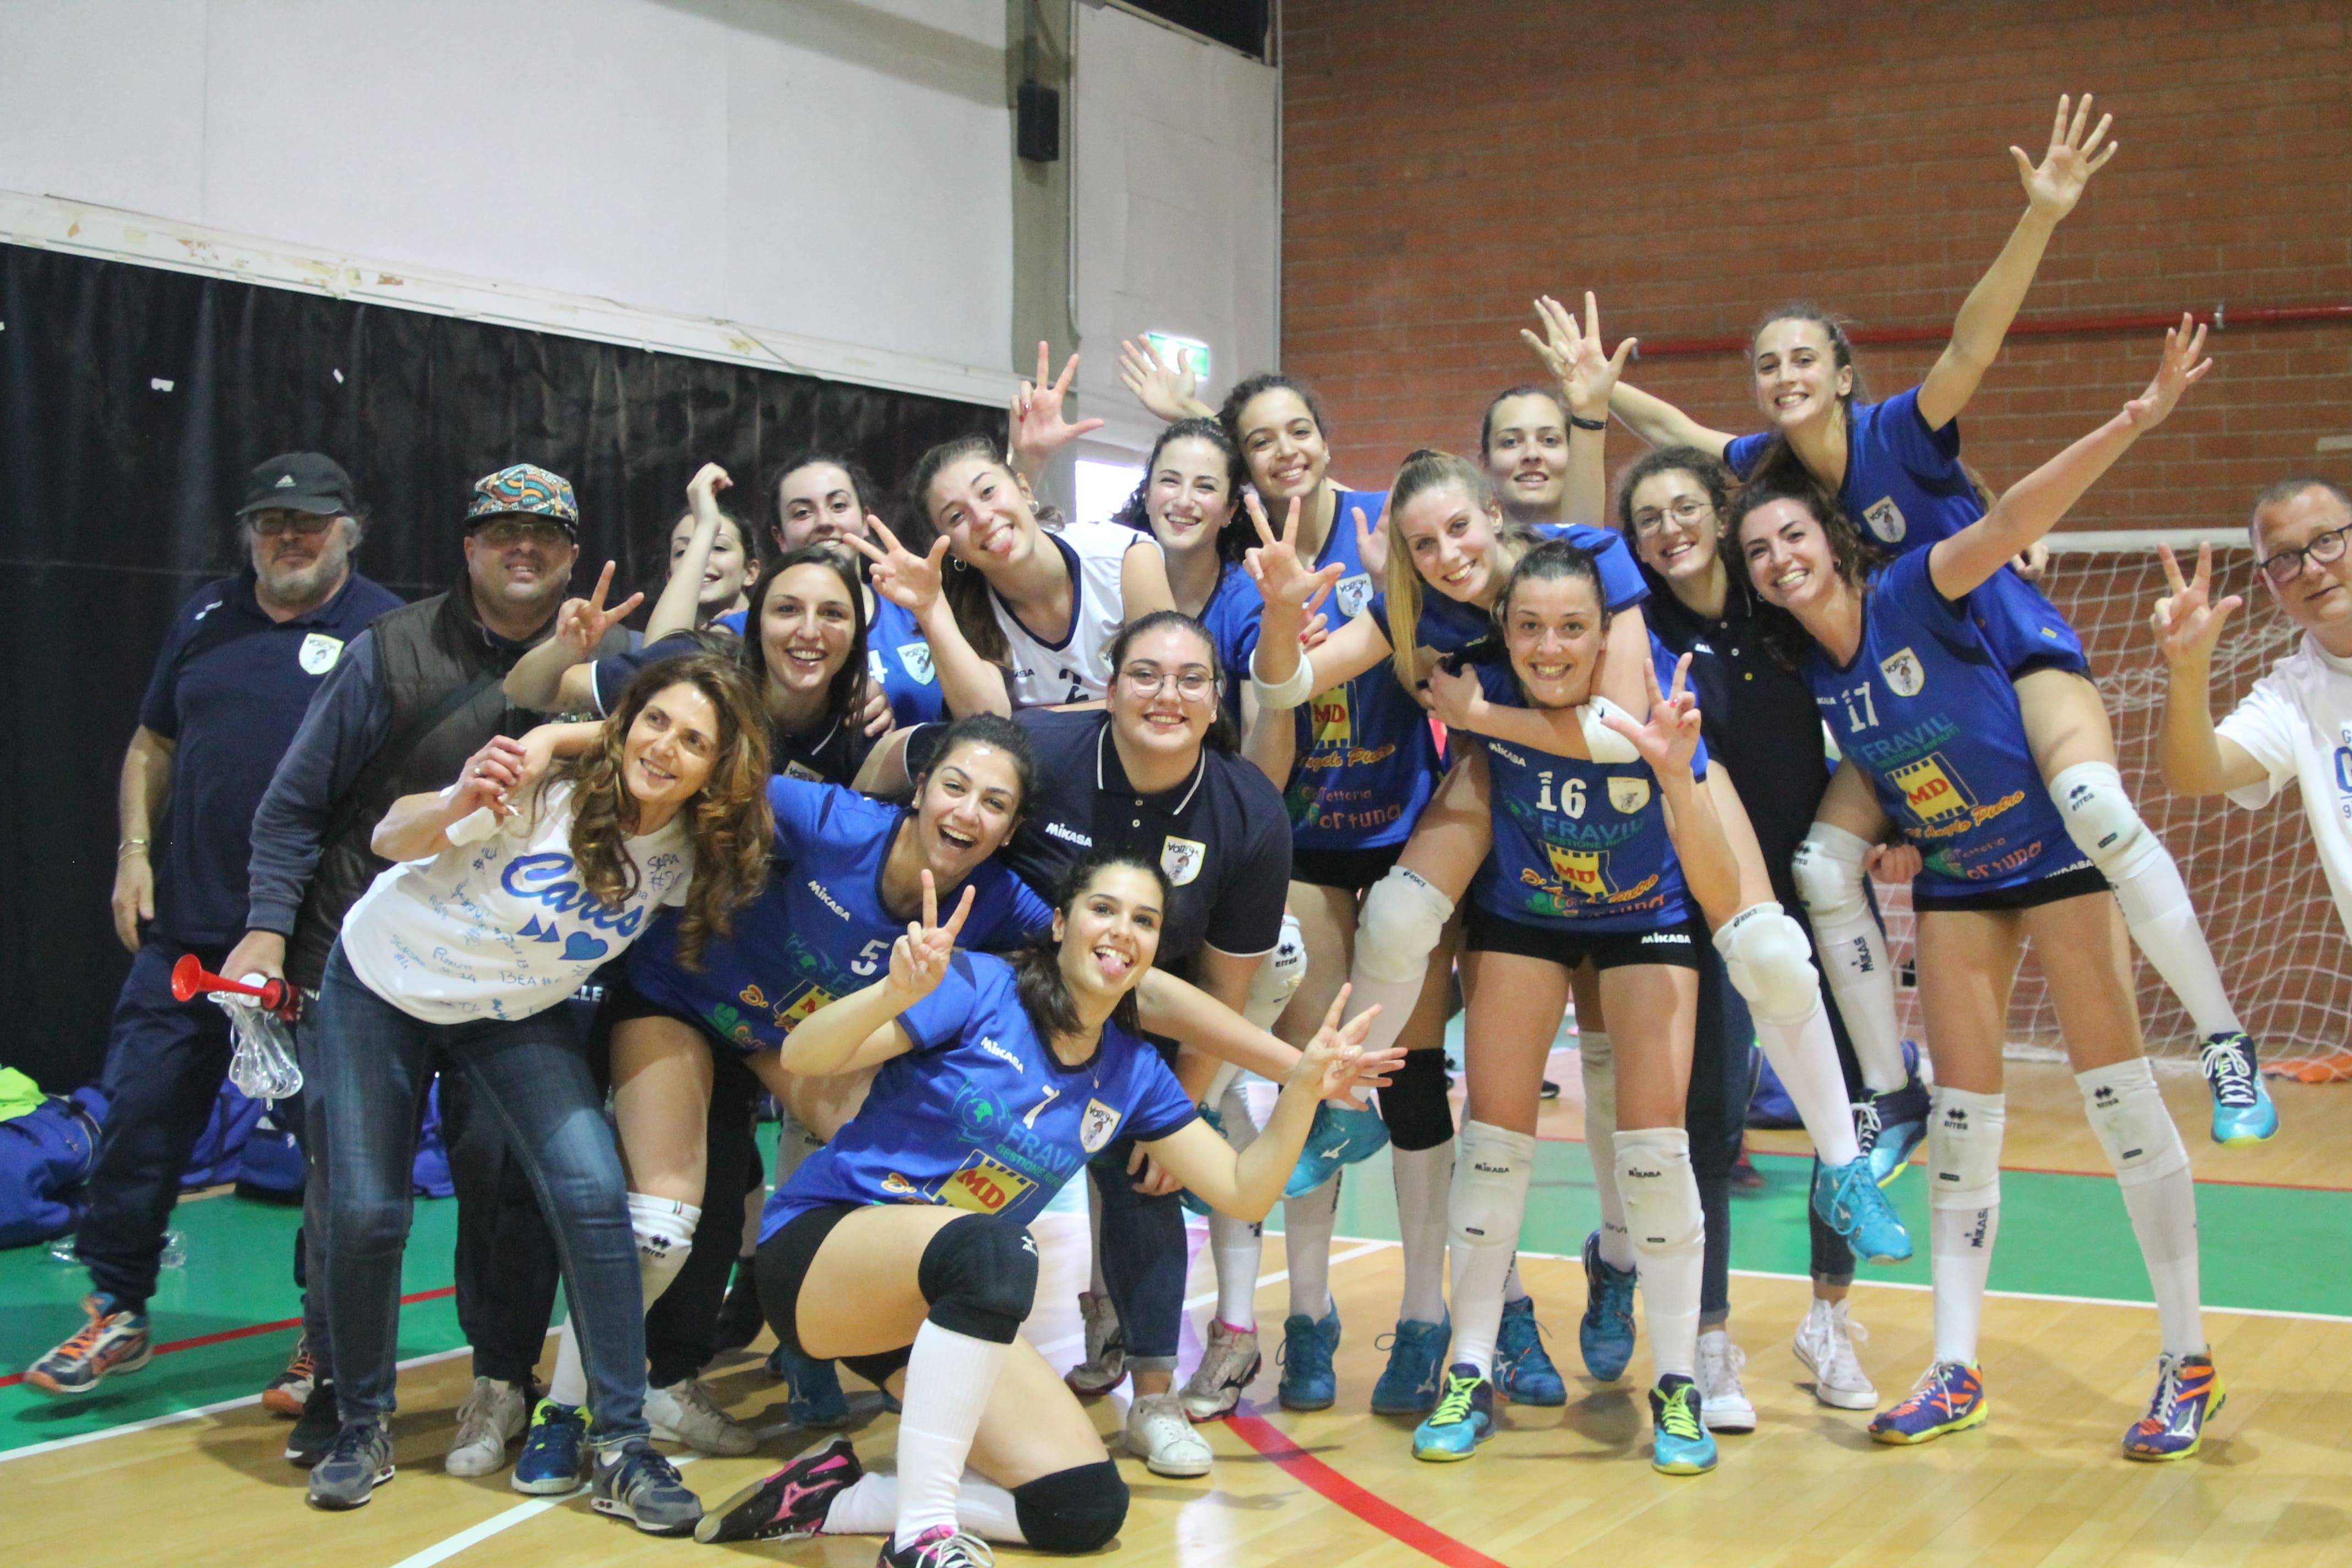 serie-c-regionale-play-off-volley-terracina-l-impresa-e-servita-3-0-al-duemila-12-e-finale-conquistata